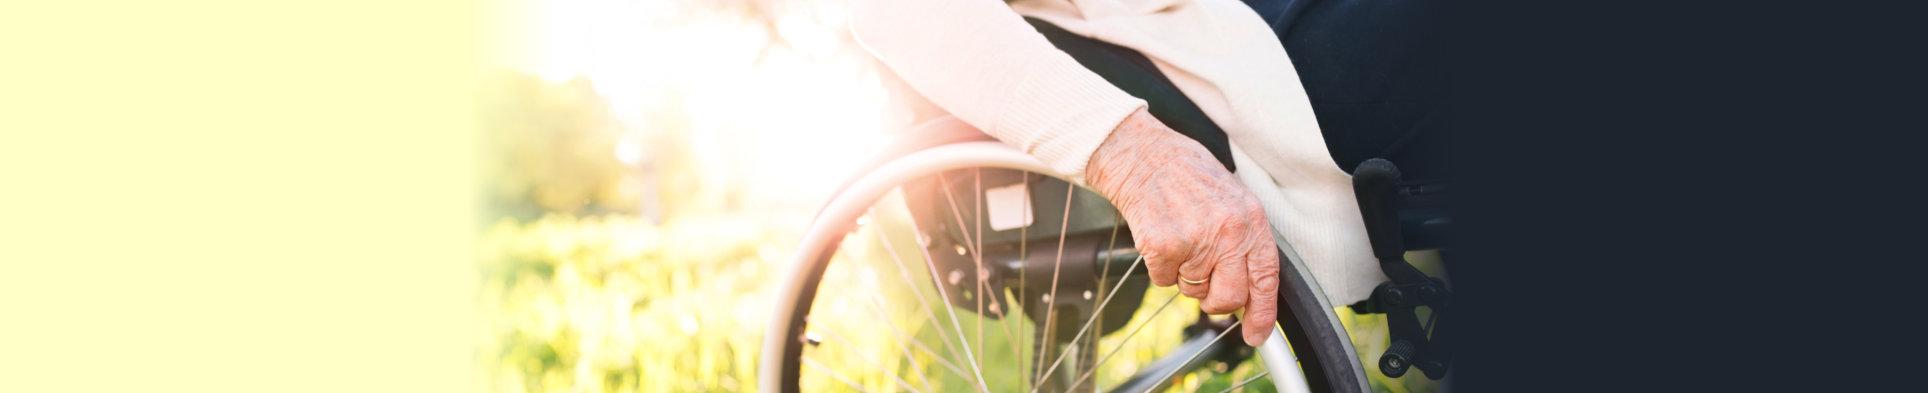 wheelchair outdoors